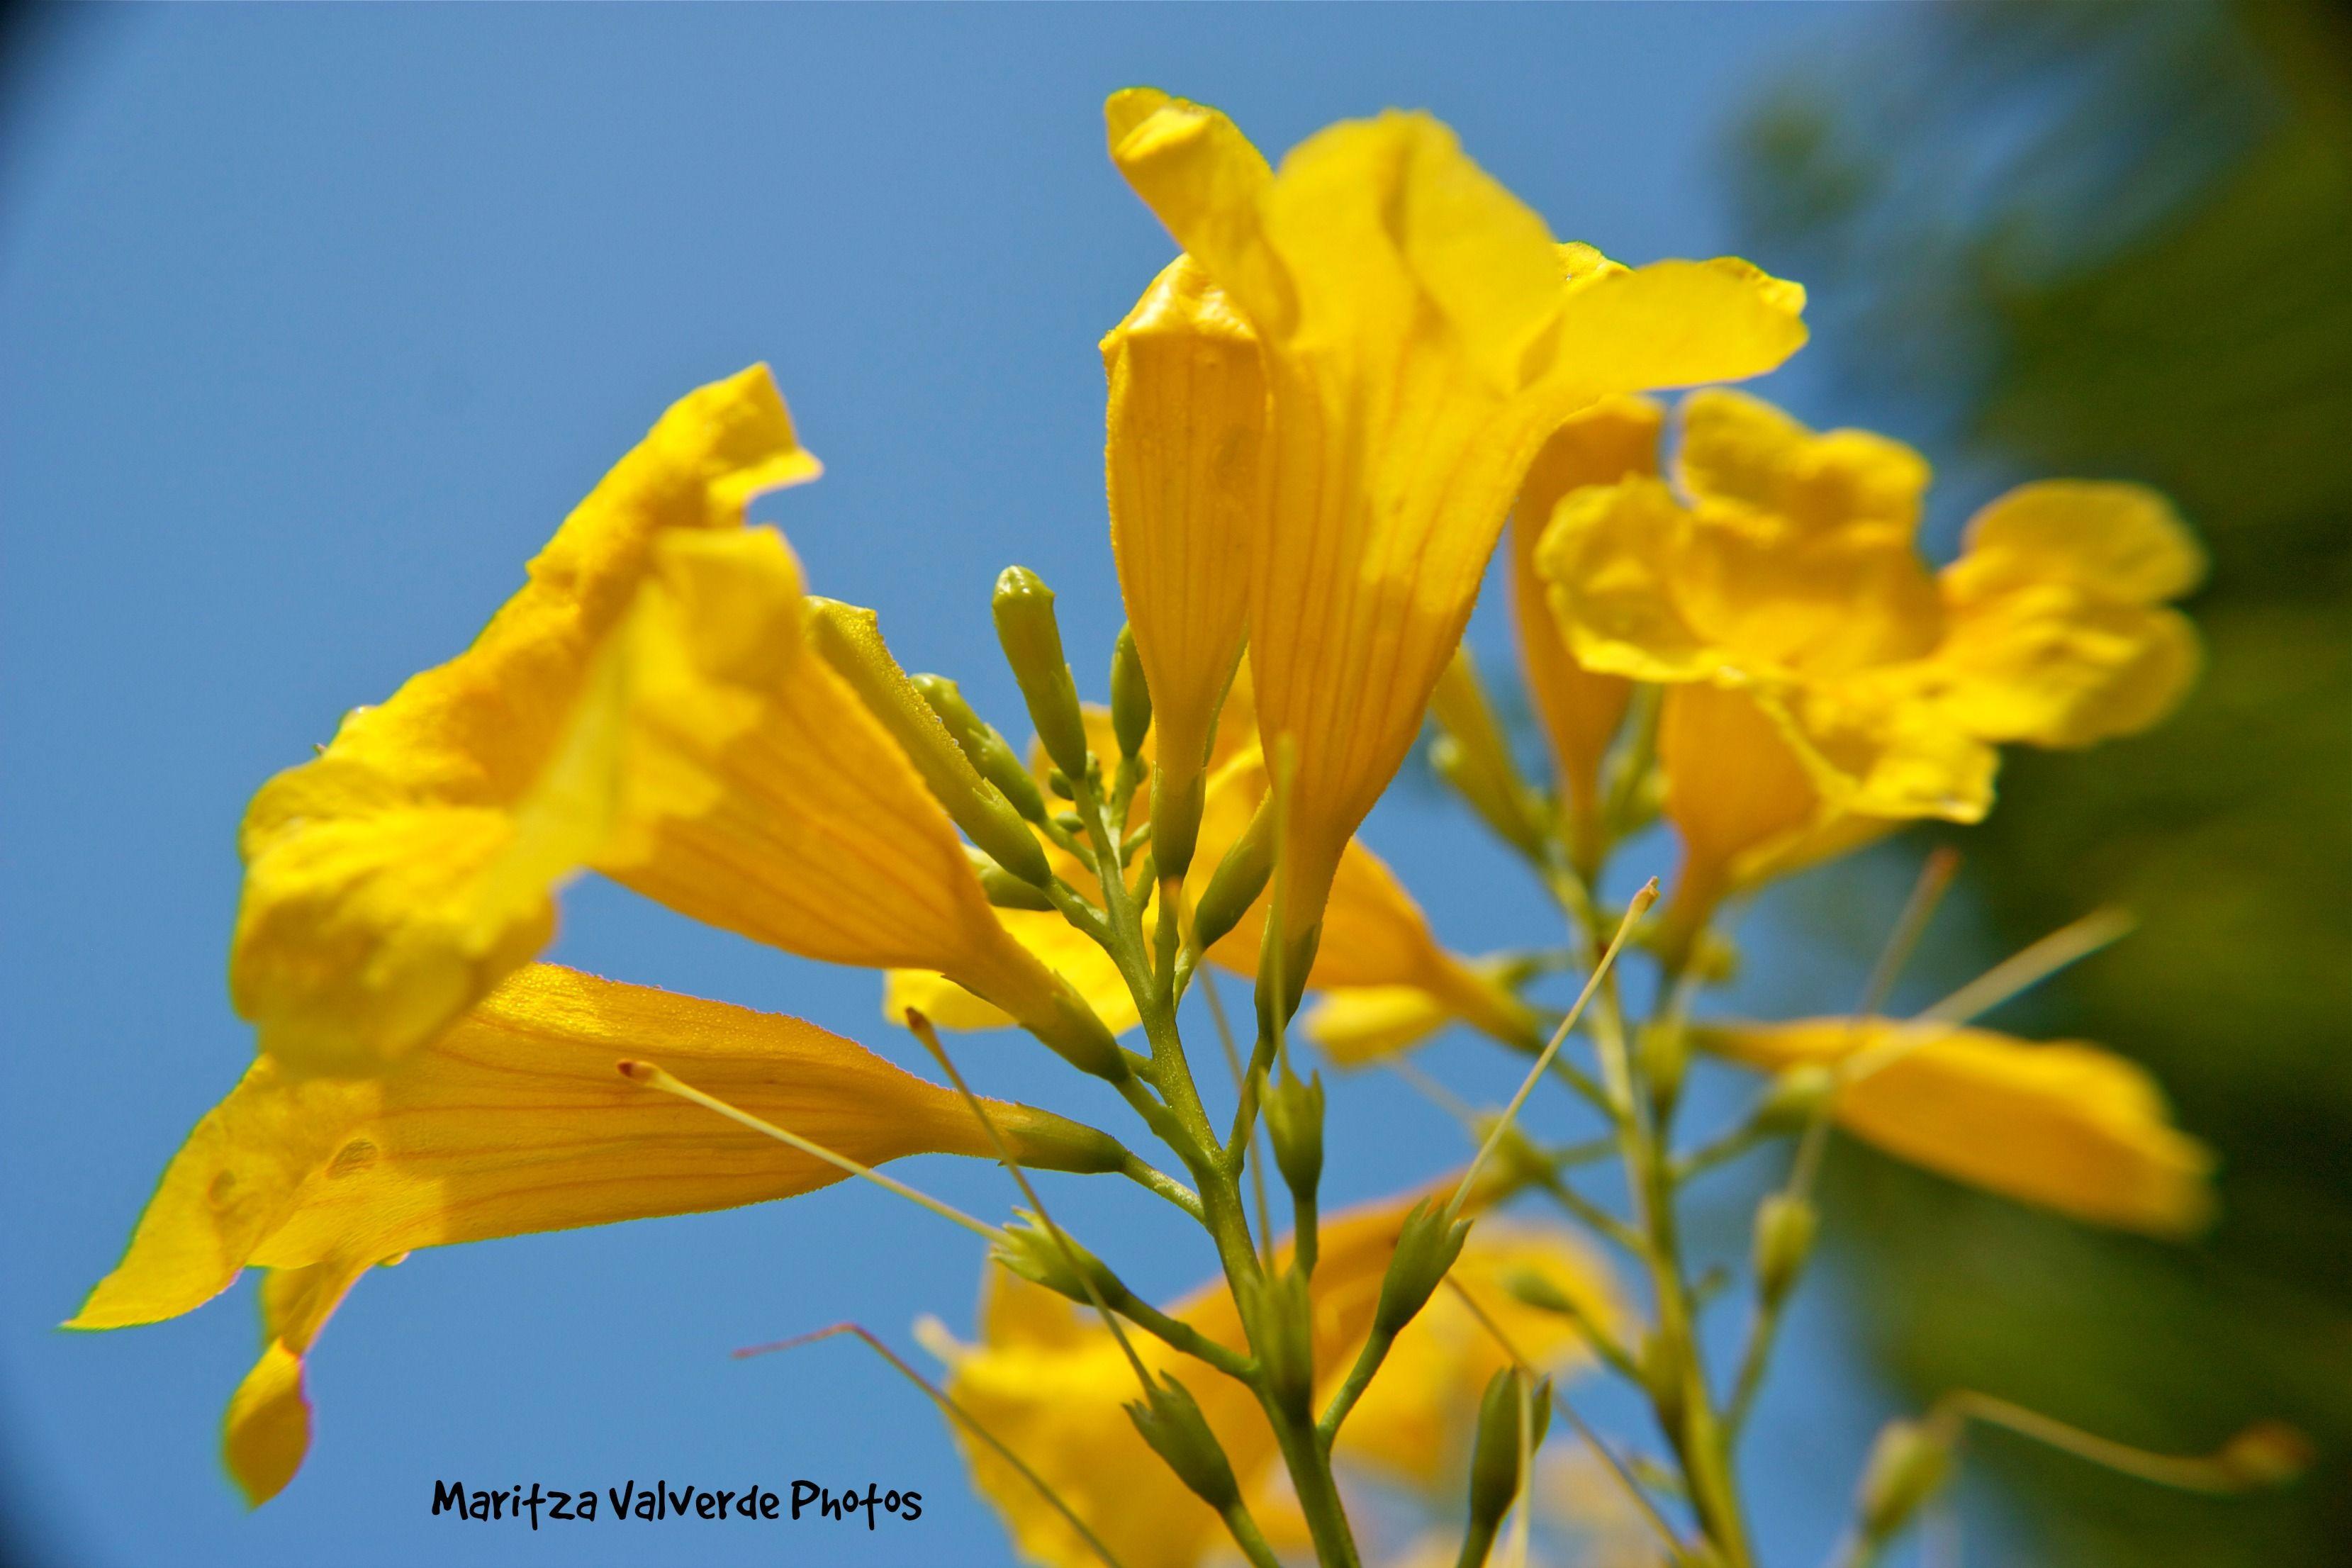 Flor amarlla